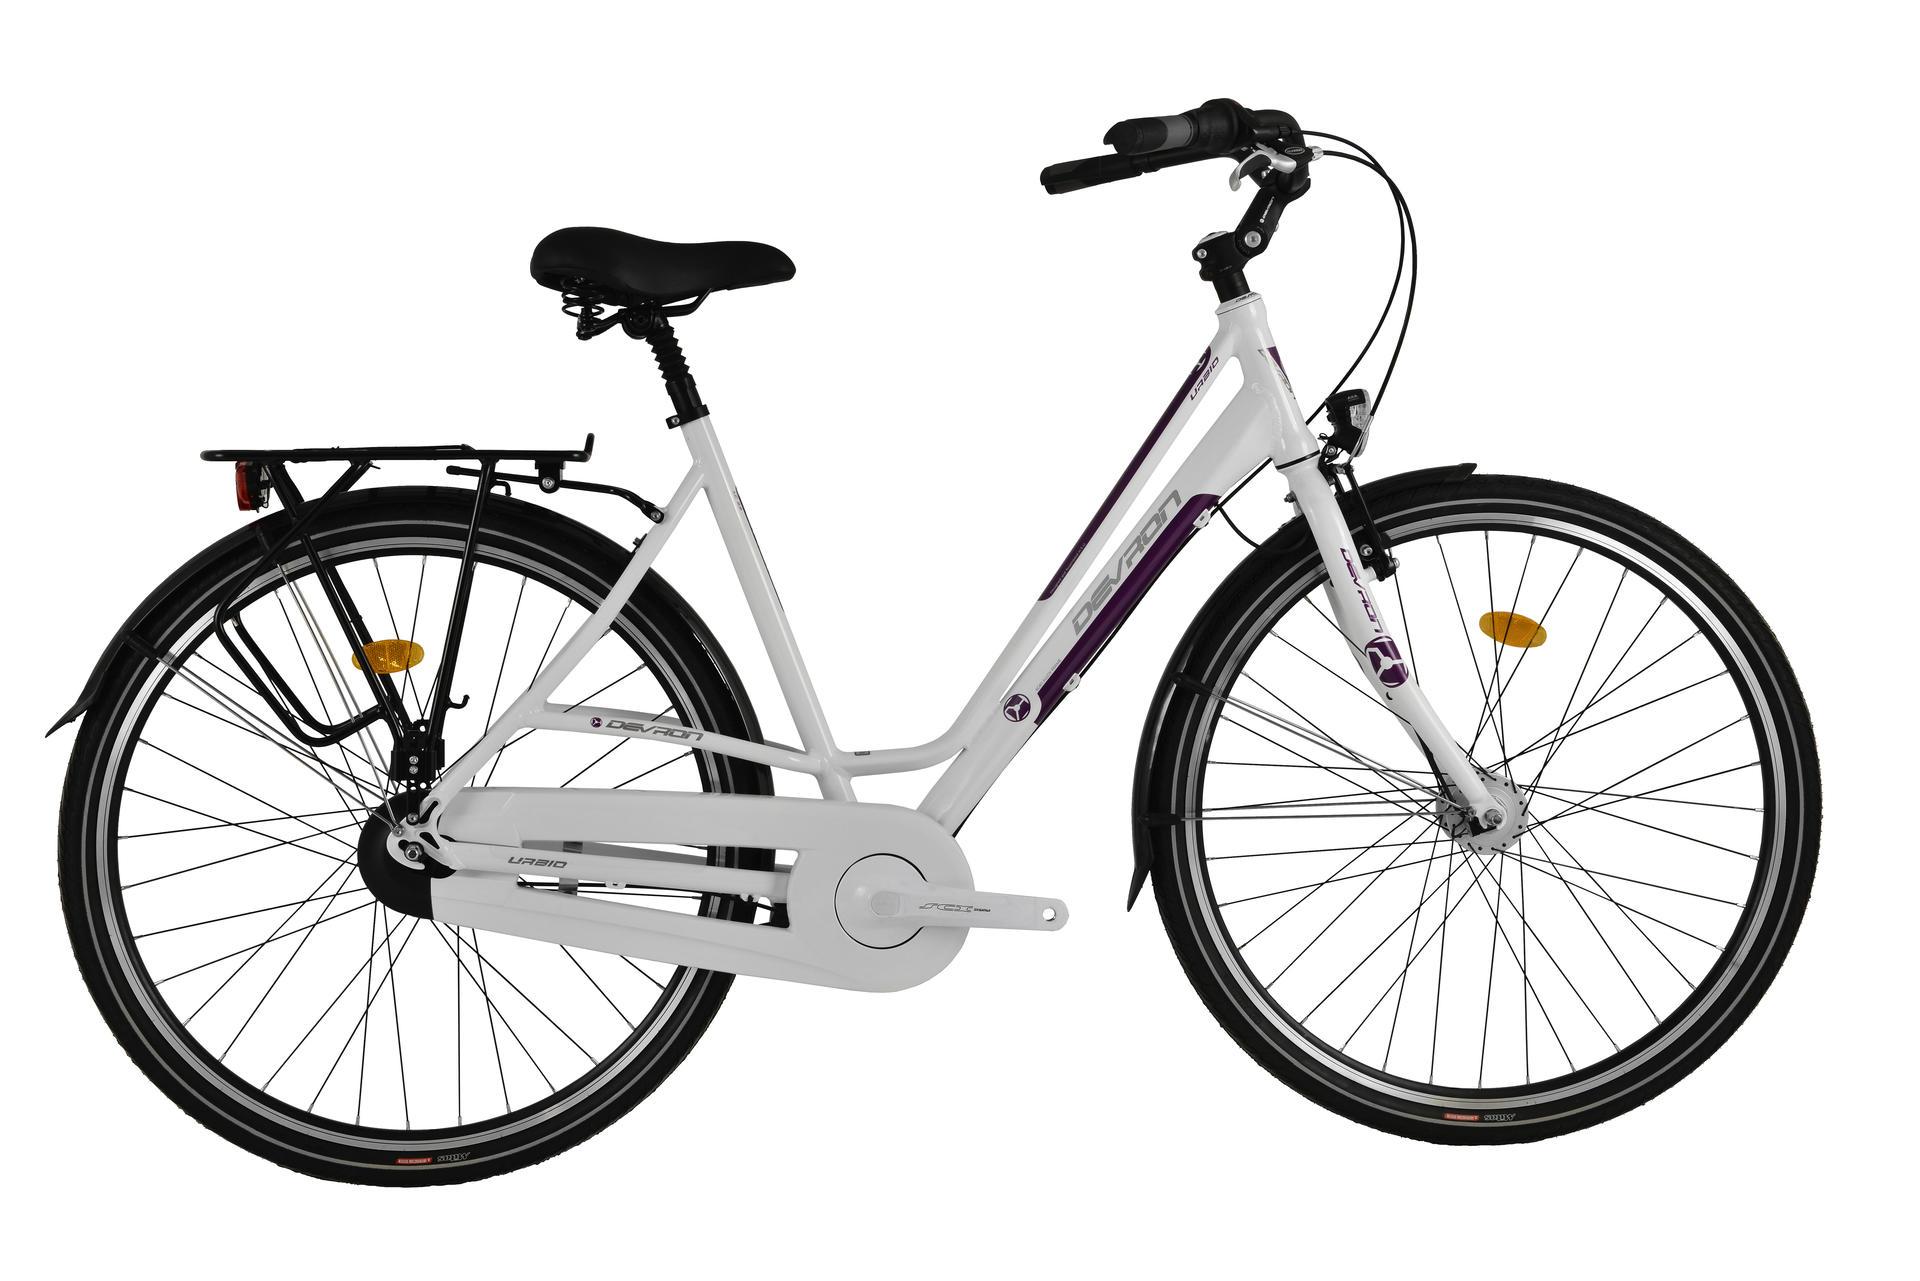 Bicicletta da città Devron Lady U.City LC2.8 Ivory White 520 mm